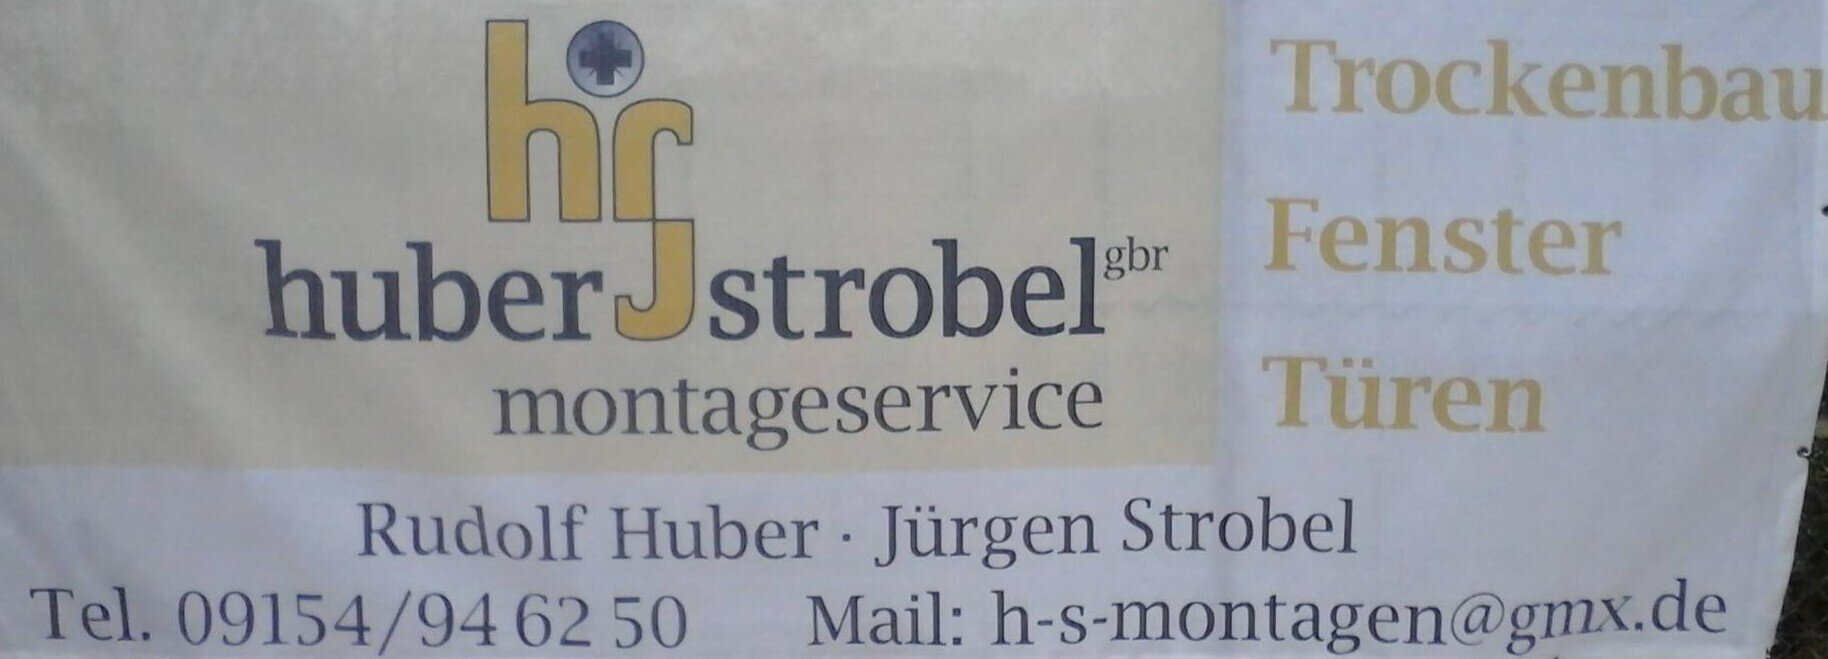 Huber & Strobel